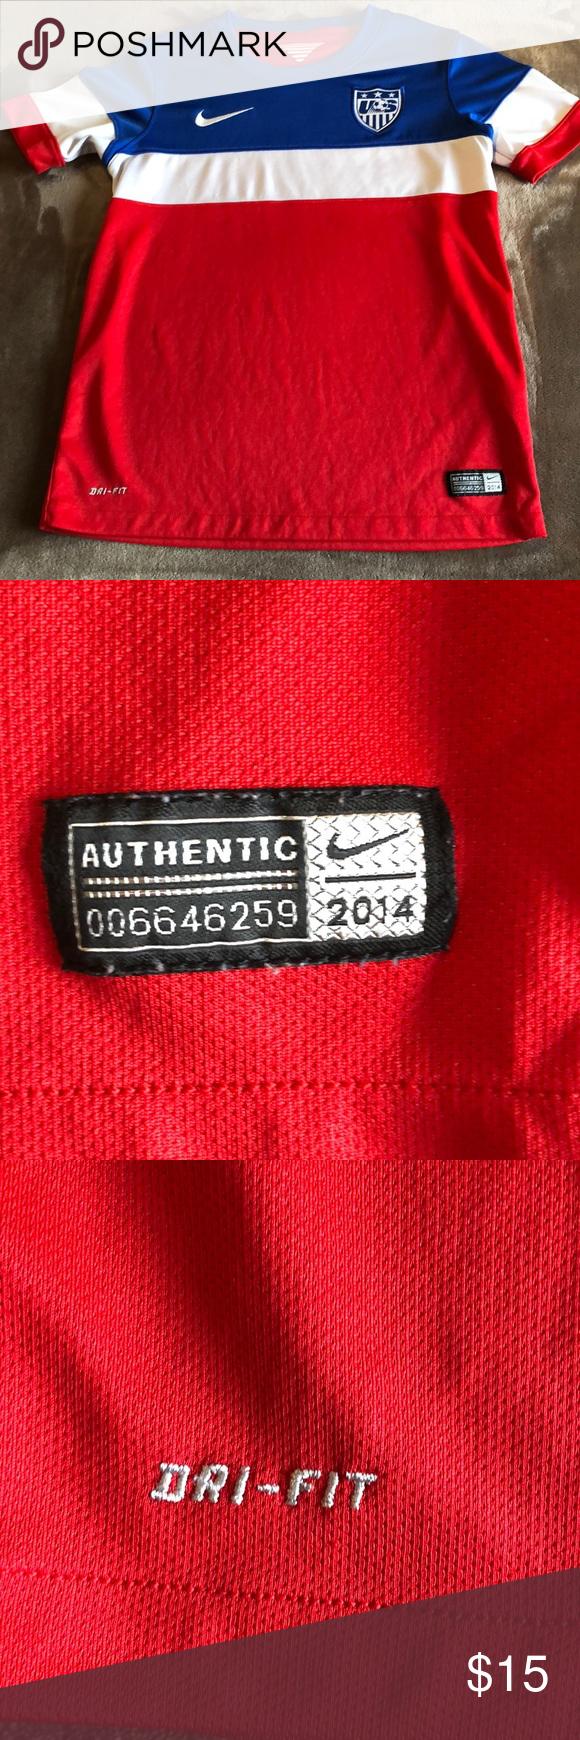 7b5ae0d5 ... Shirts Tees - Short Sleeve · Team USA Nike shirt Nike Dri-fit team USA  shirt, great condition, tiny